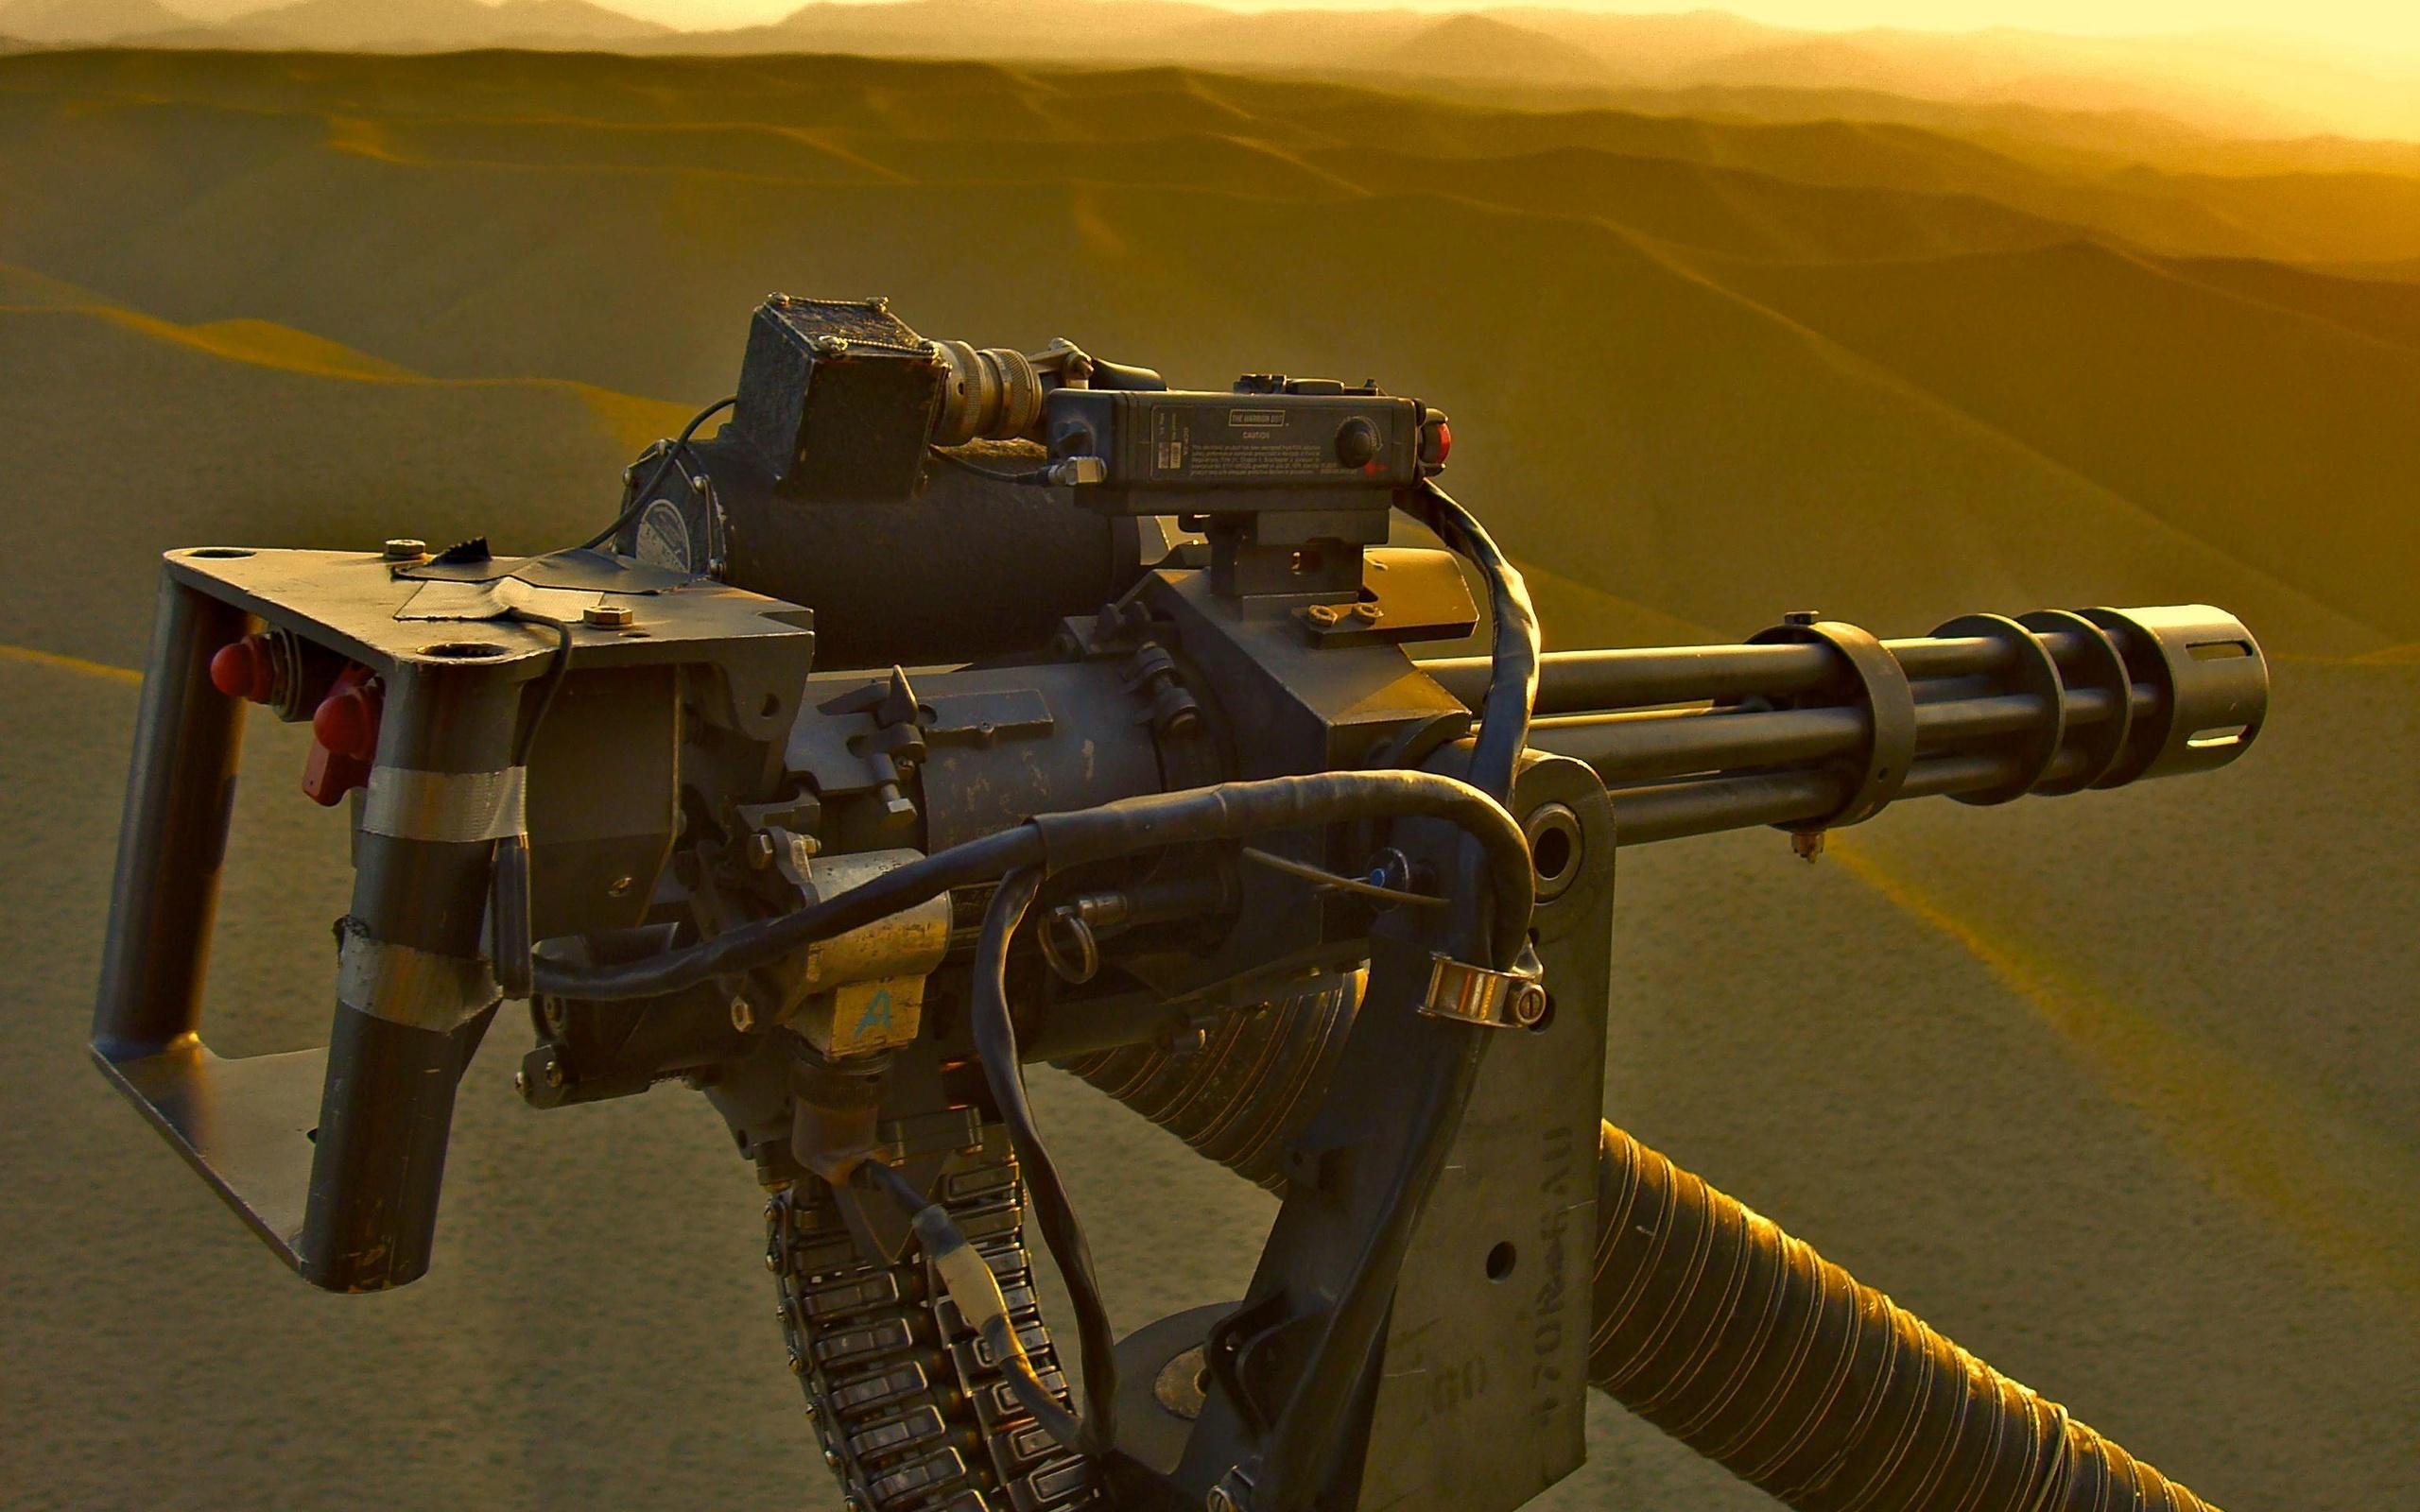 Machine Gun High Quality Background on Wallpapers Vista